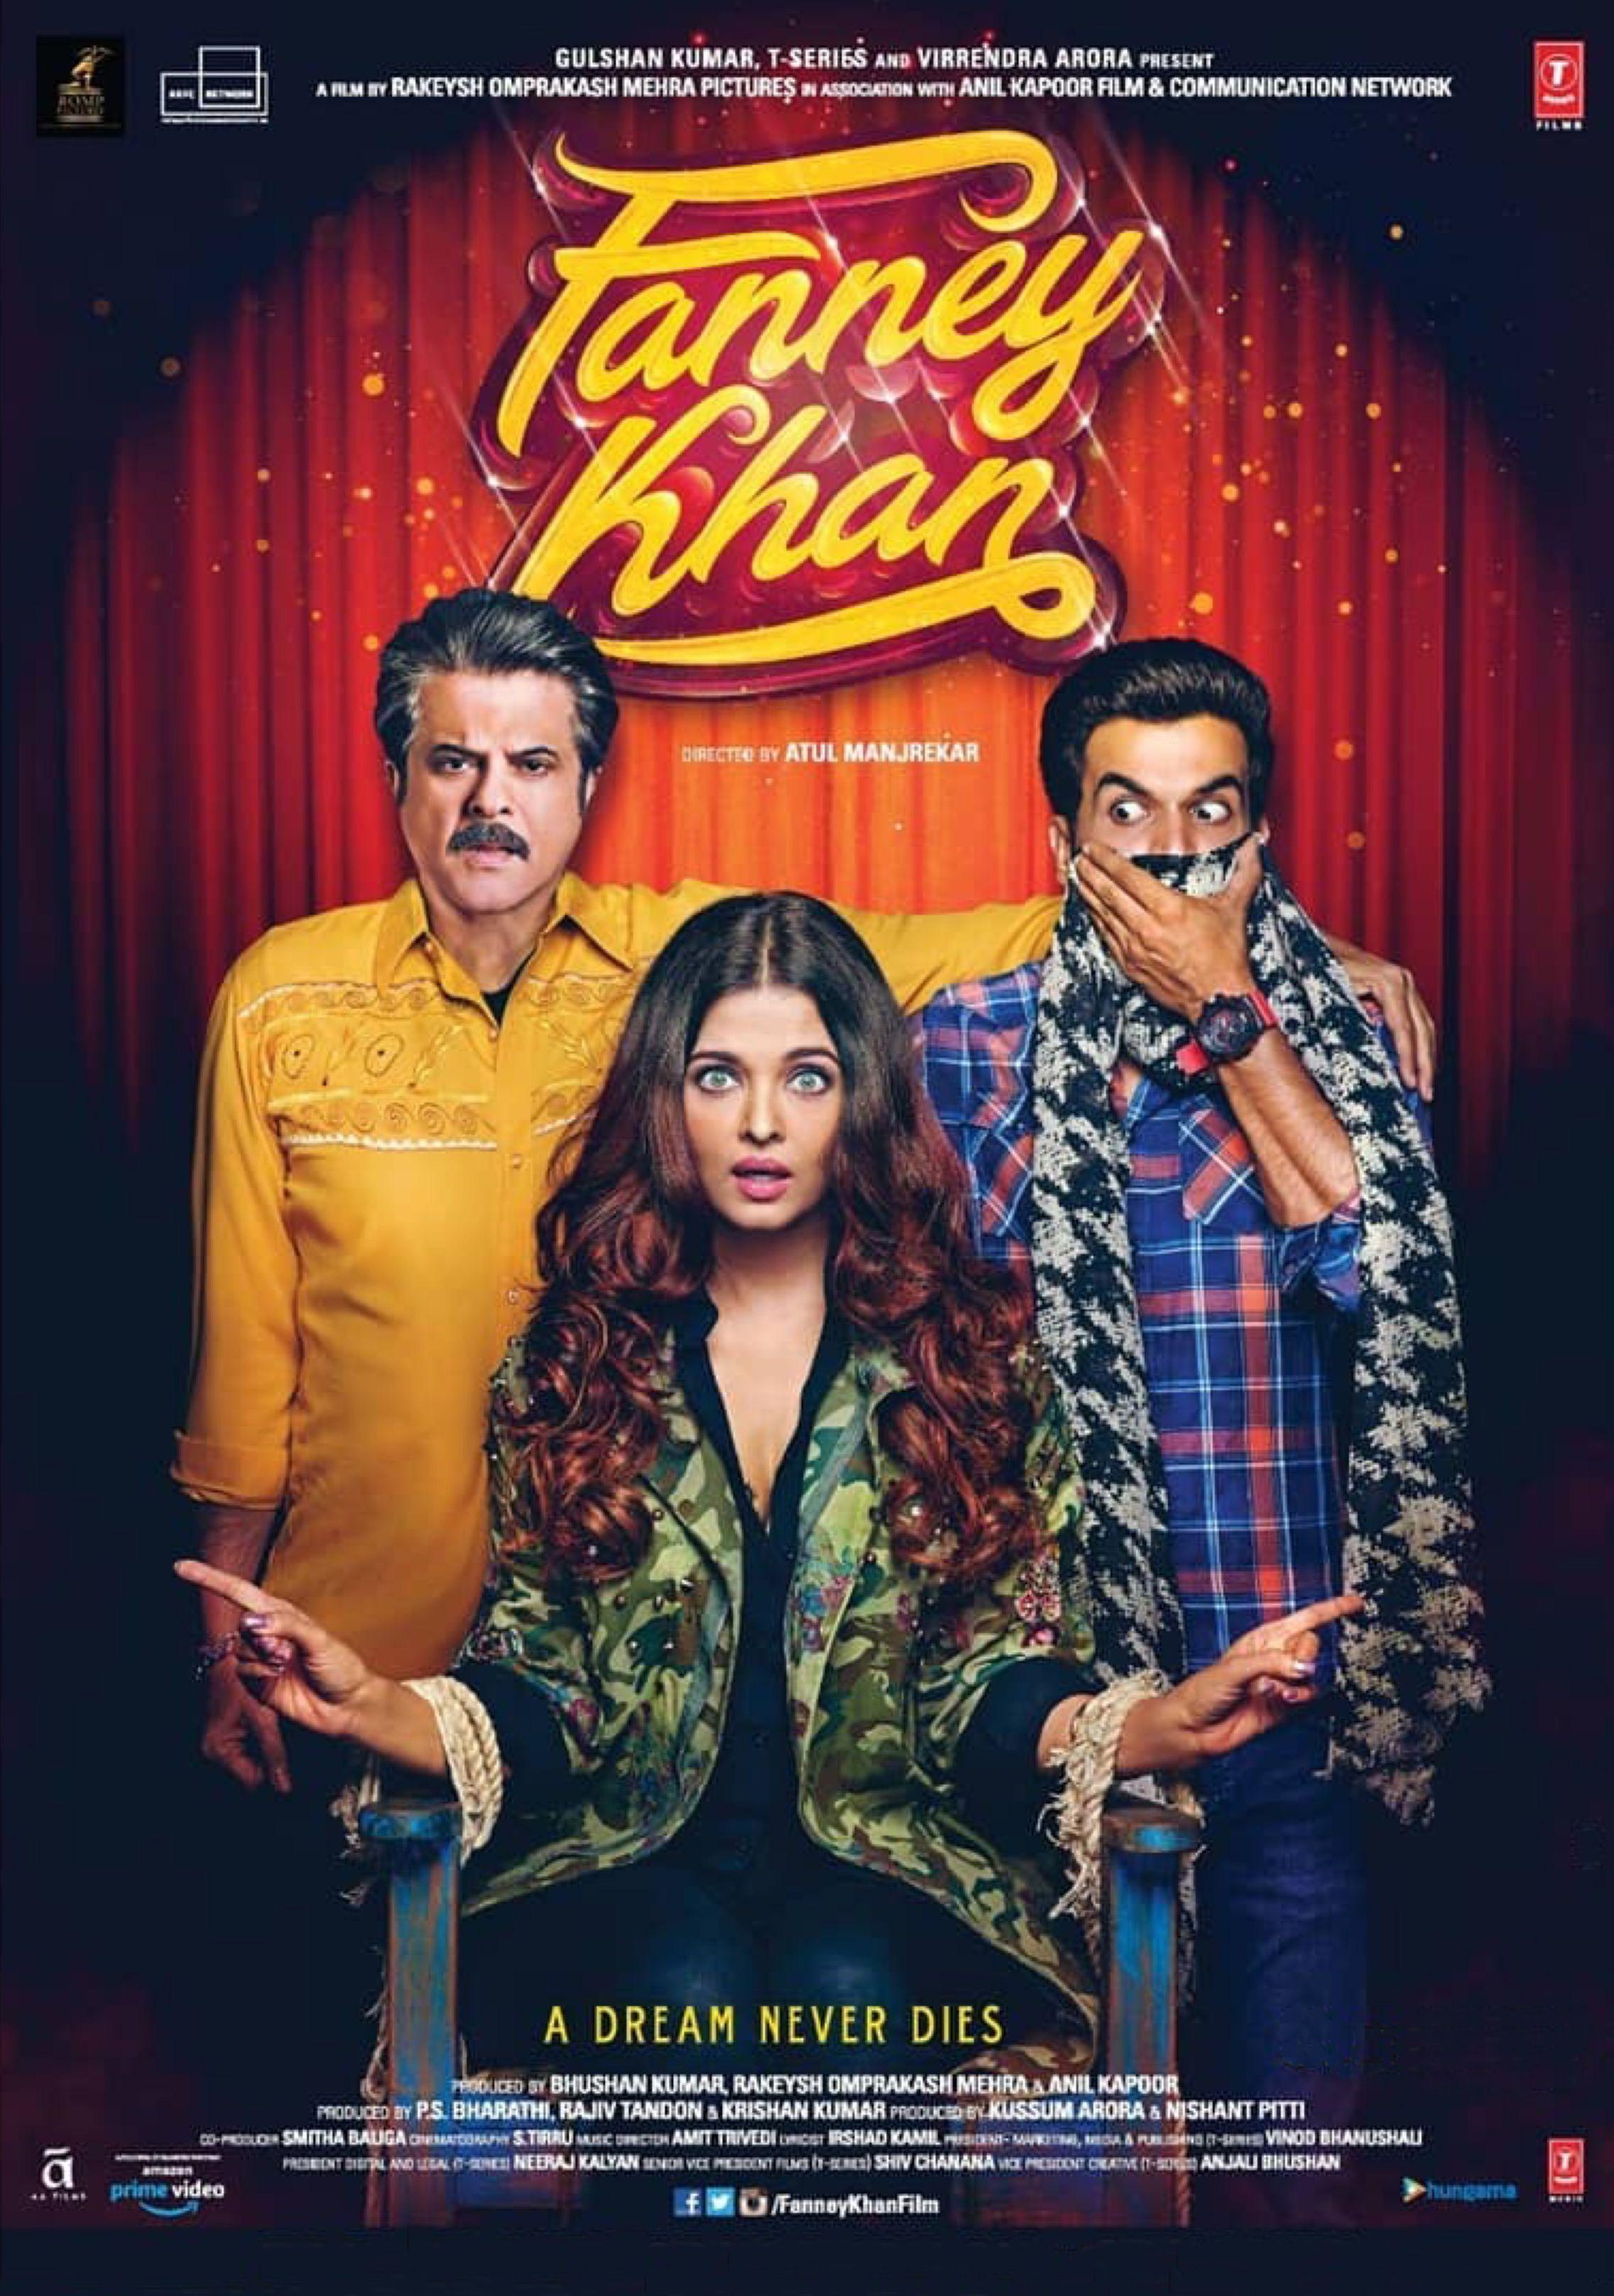 Fanney Khan 2018 Starring Aishwarya Rai Bachchan Anil Kapoor Rajkummar Rao Divya Dutta Anaitha Nair Pihu Indie Movie Posters Hindi Movies Indie Movies